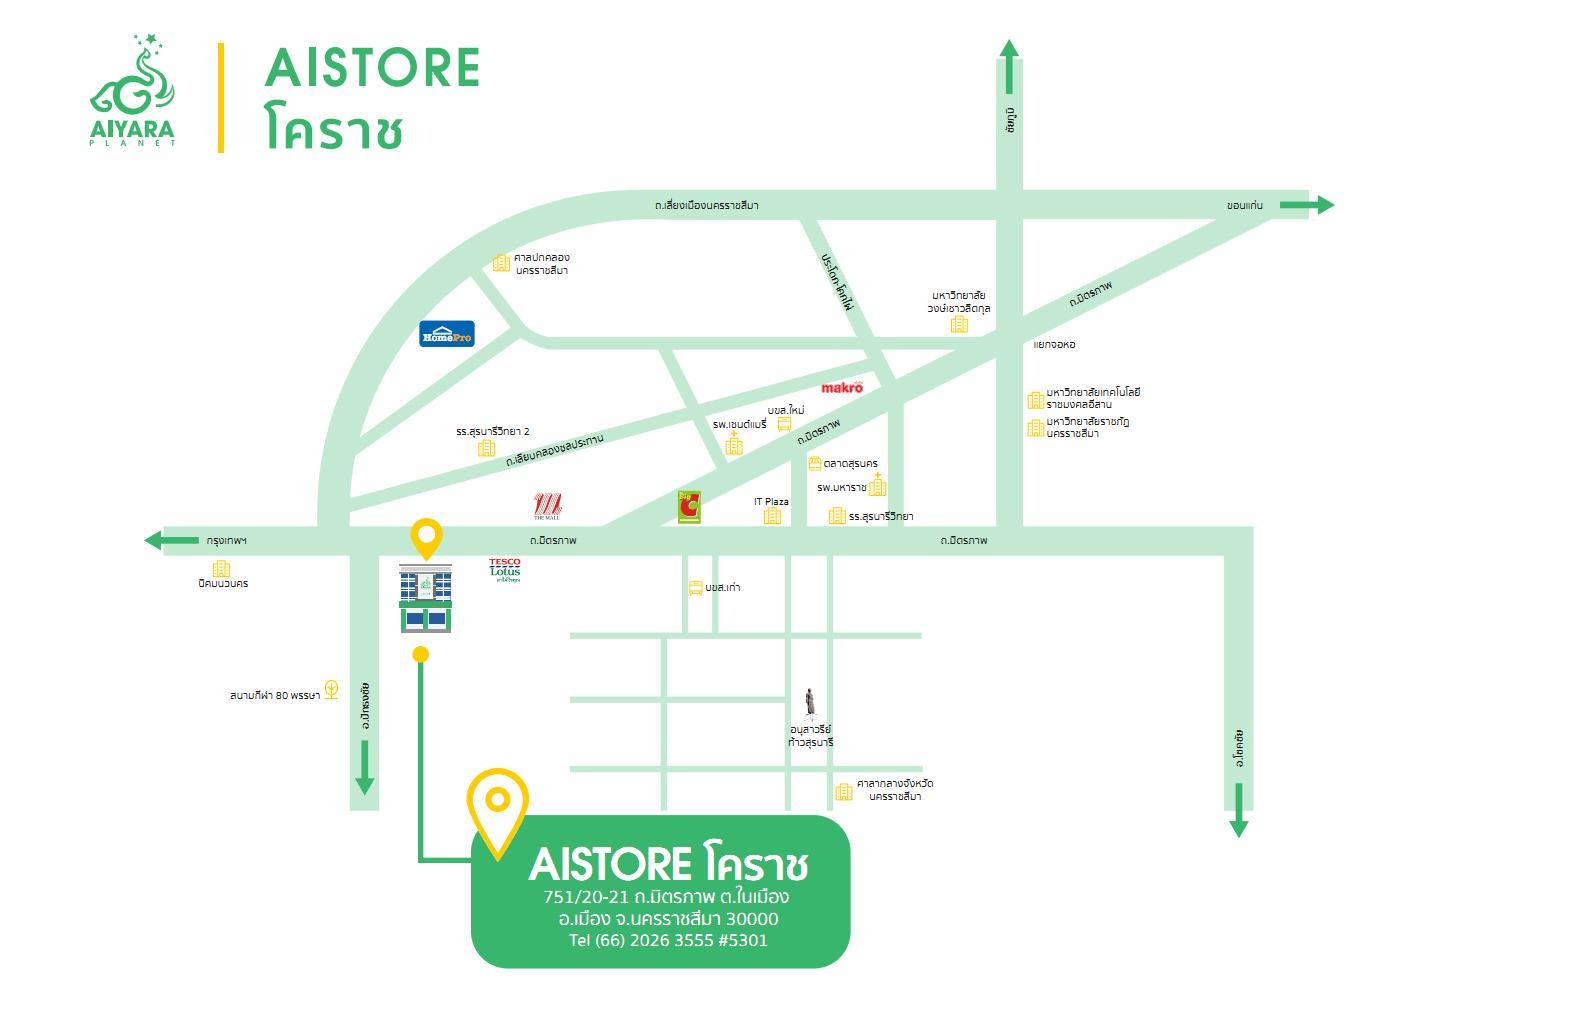 AISTORE โคราช, ประเทศไทย